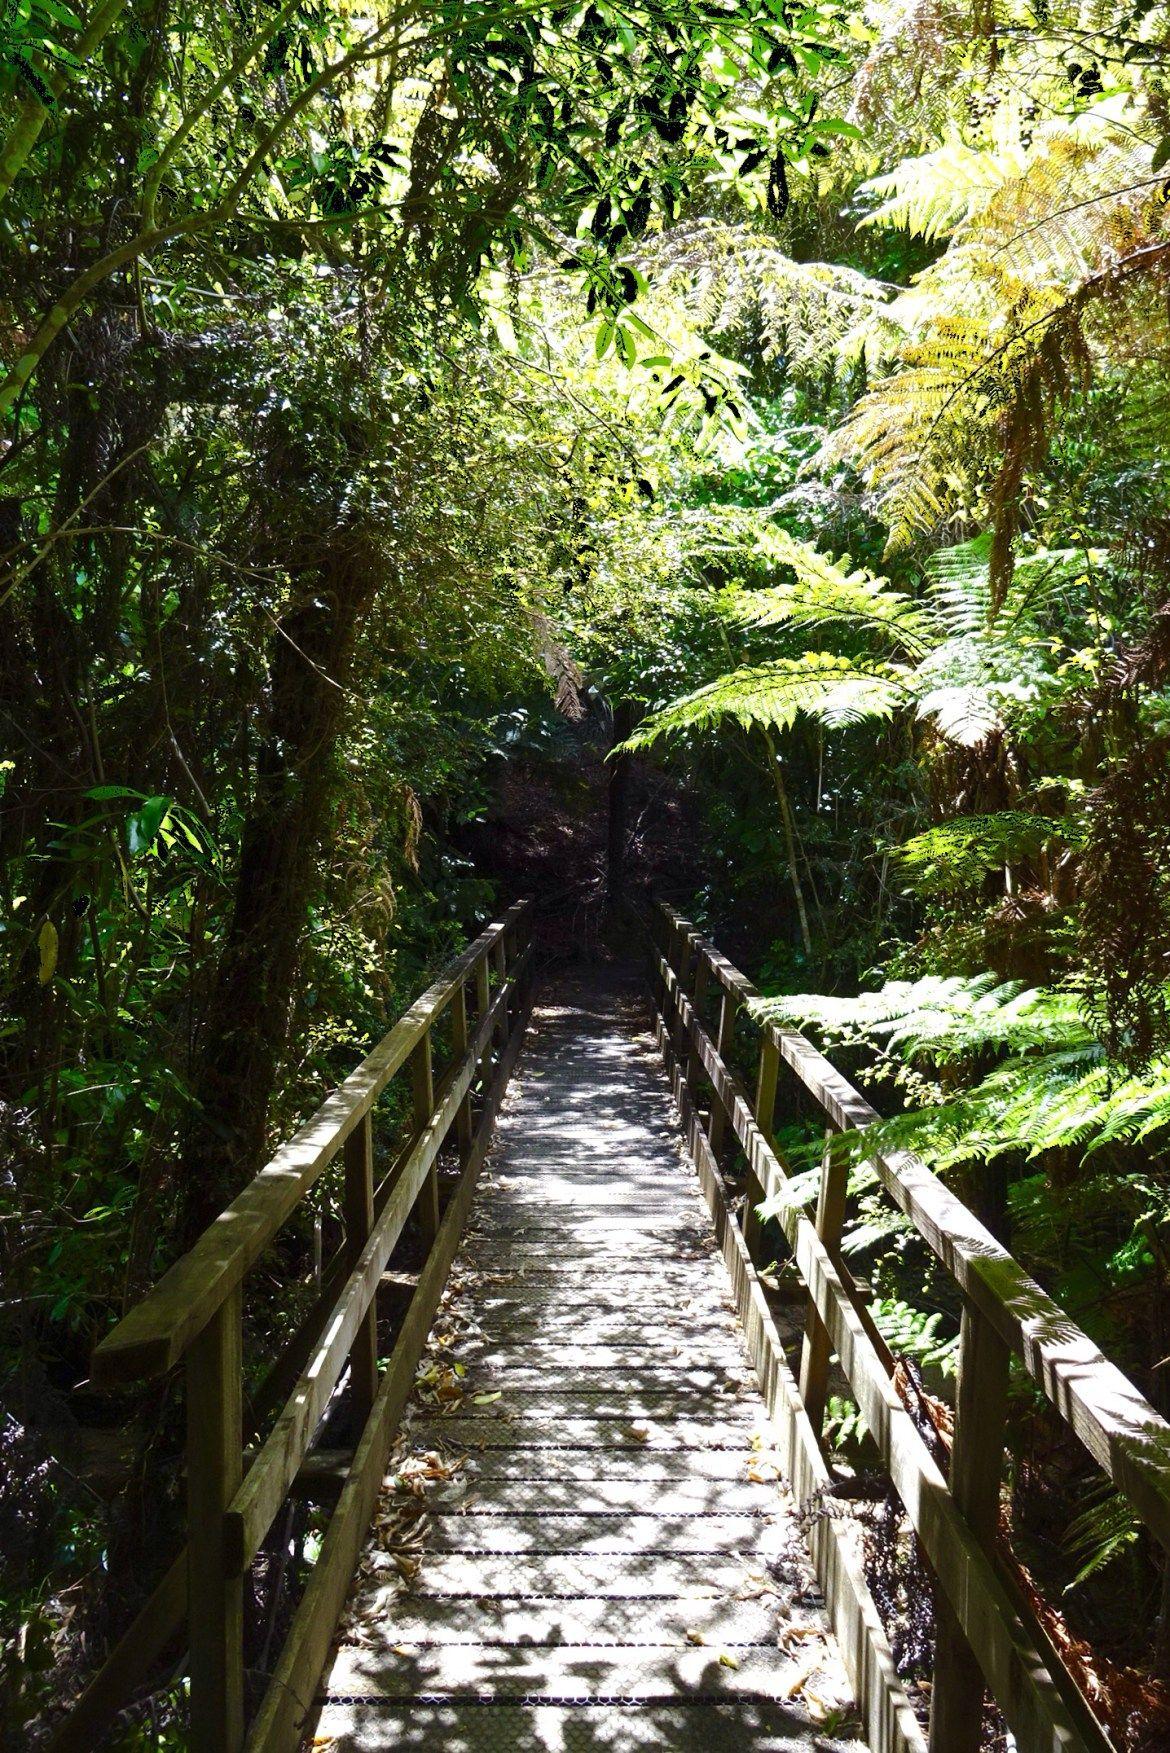 Hiking The Abel Tasman Coast Track - Spin The Windrose